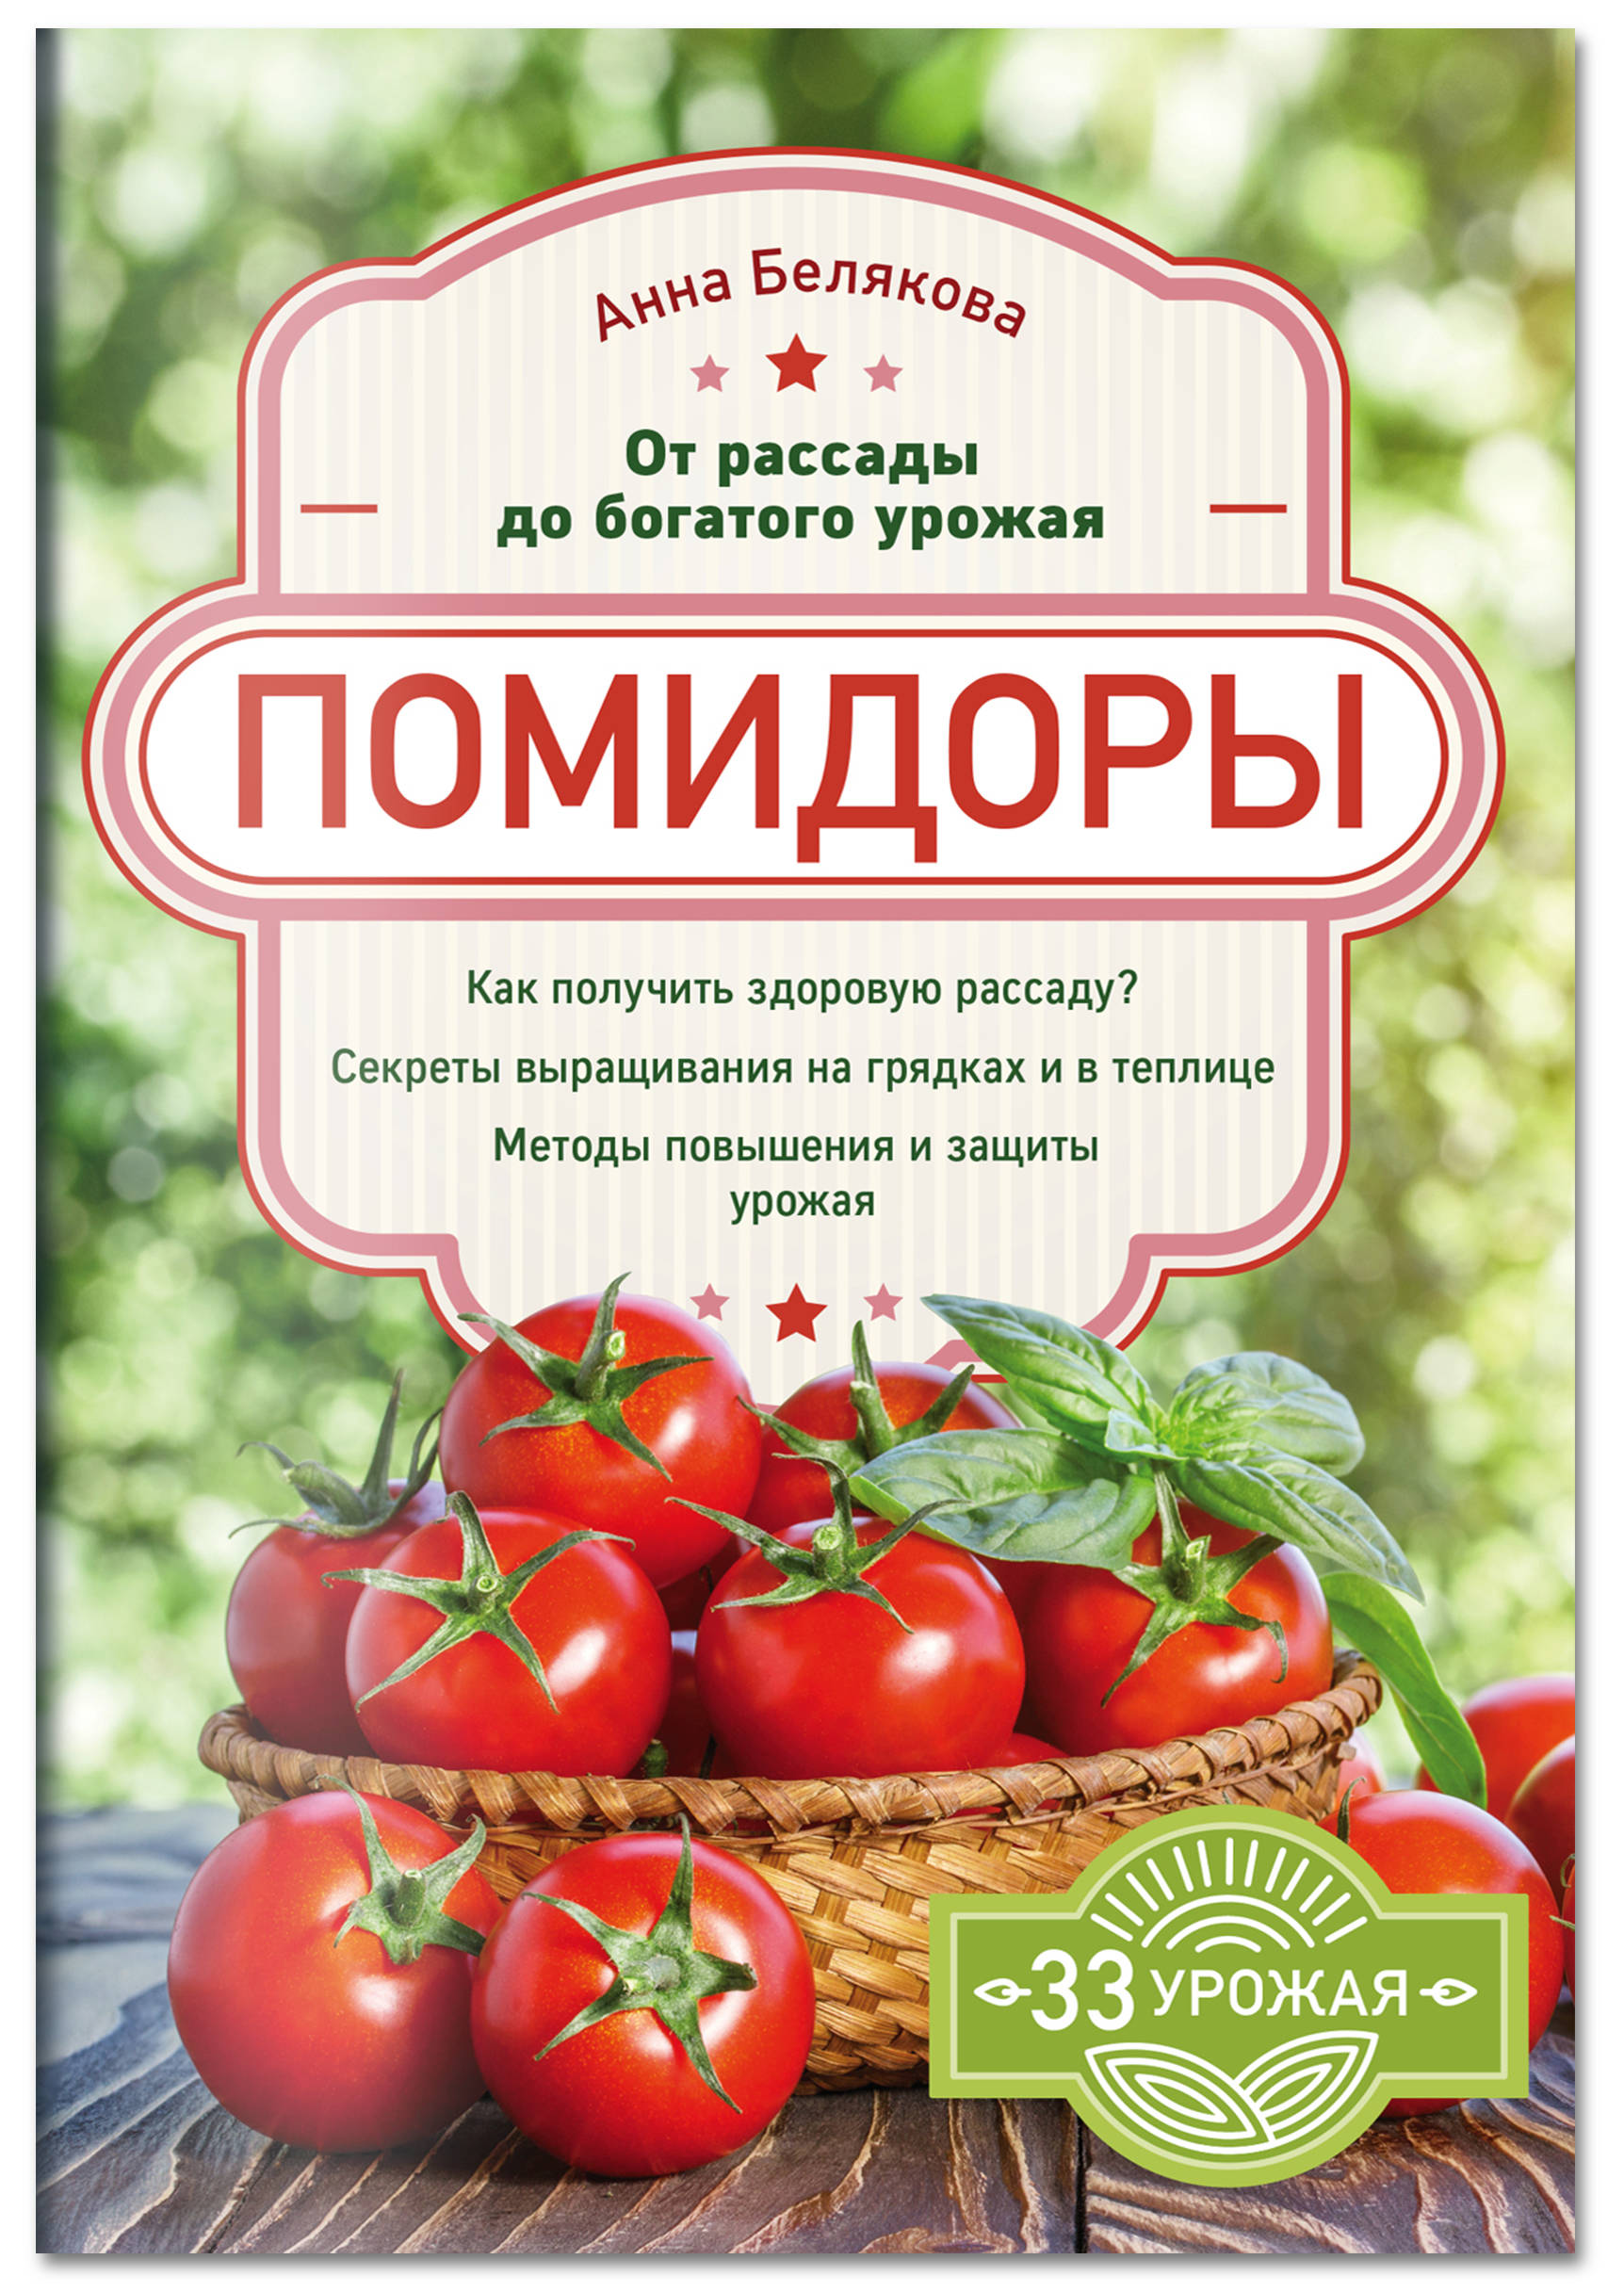 Анна Белякова Помидоры. От рассады до богатого урожая анна белякова тюльпаны от луковицы до цветка